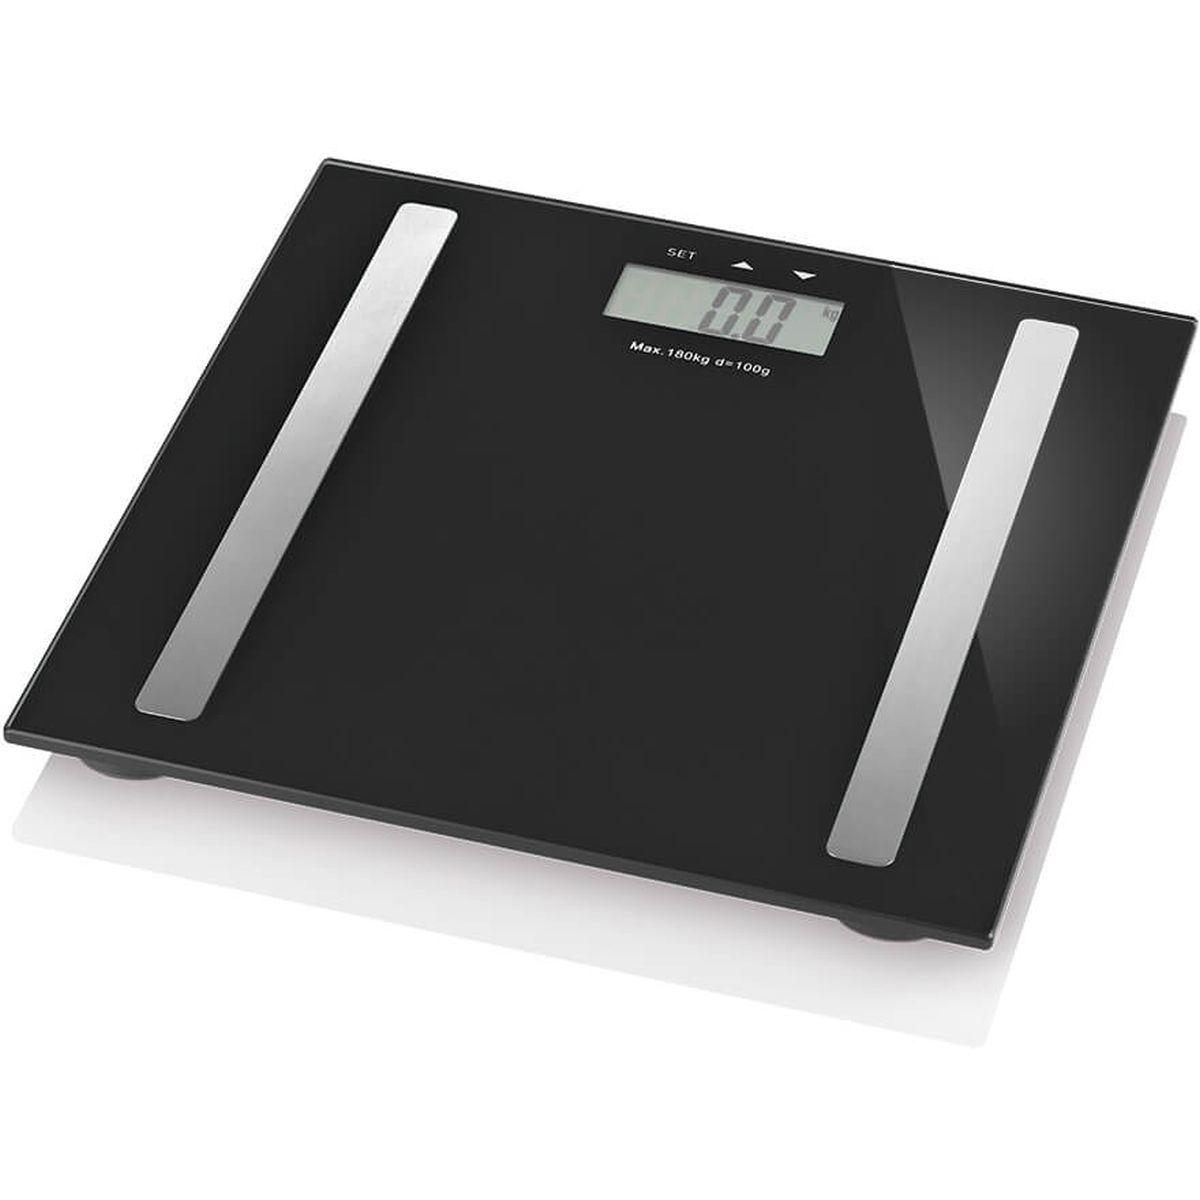 Balanca Eletronica DIGI-HEALTH PRO LCD 180G Preta